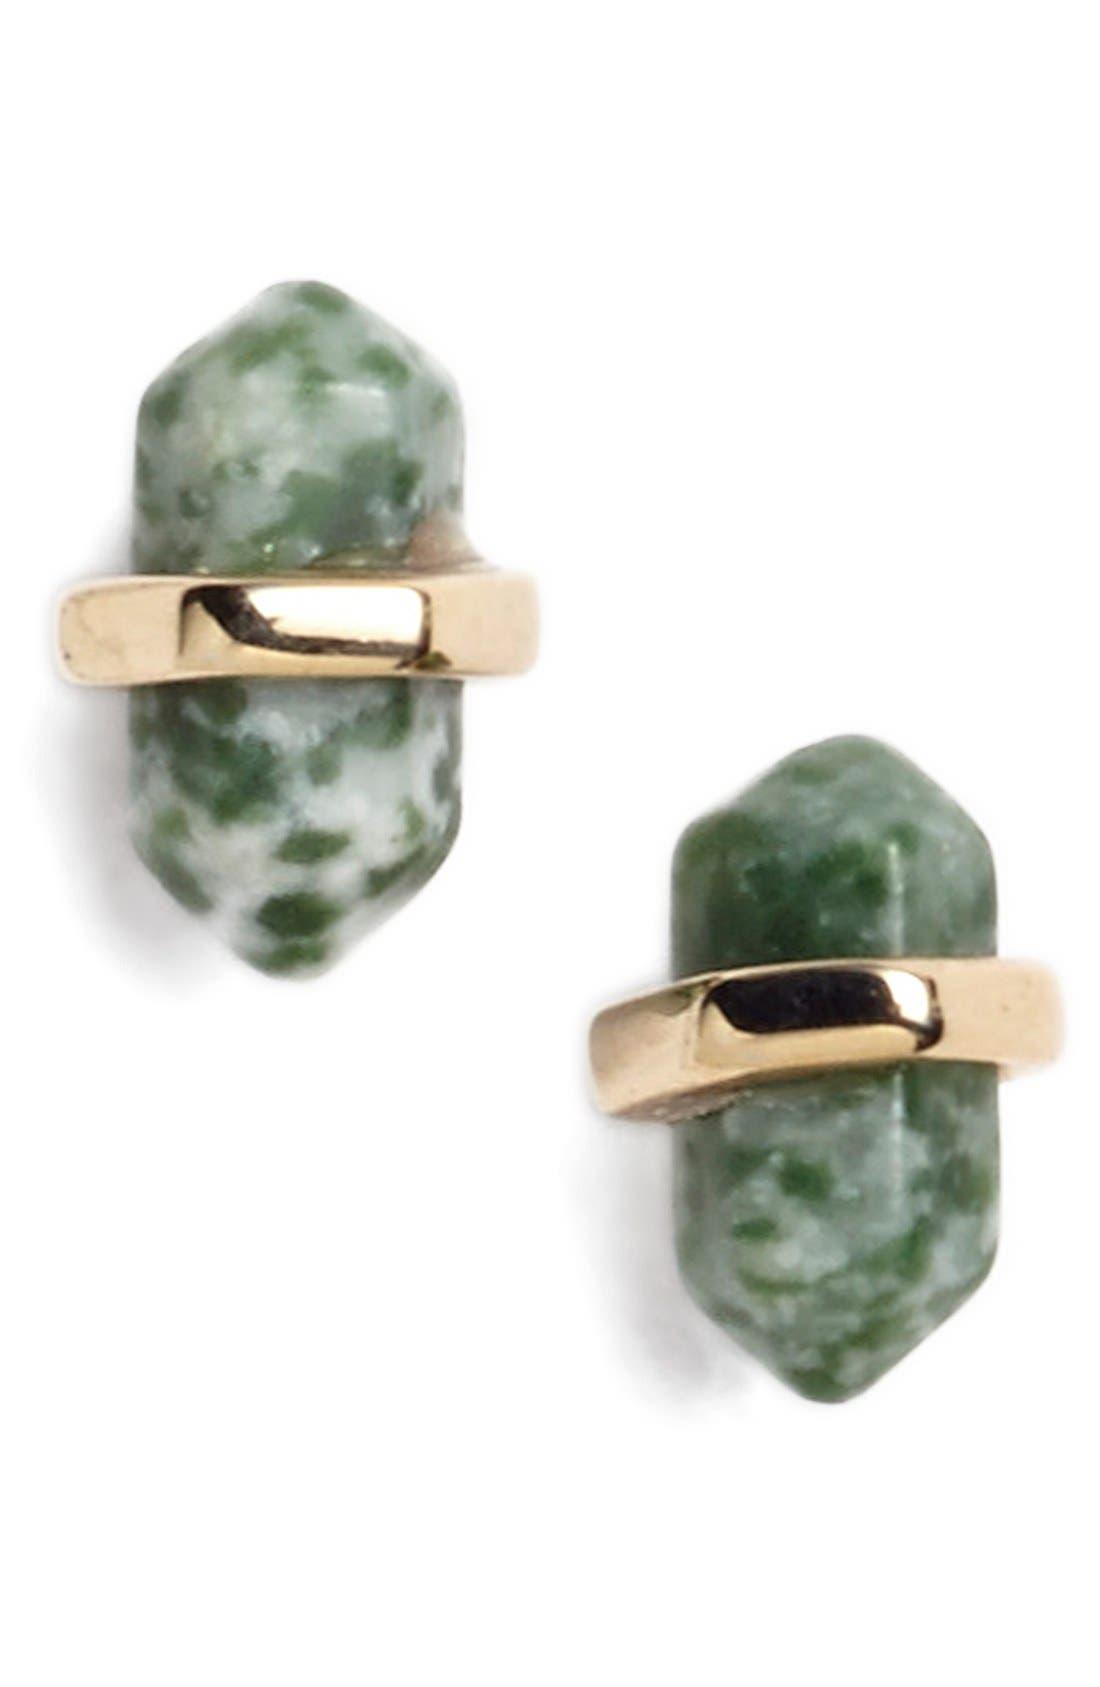 Alternate Image 1 Selected - Nordstrom Semiprecious Stone Stud Earrings